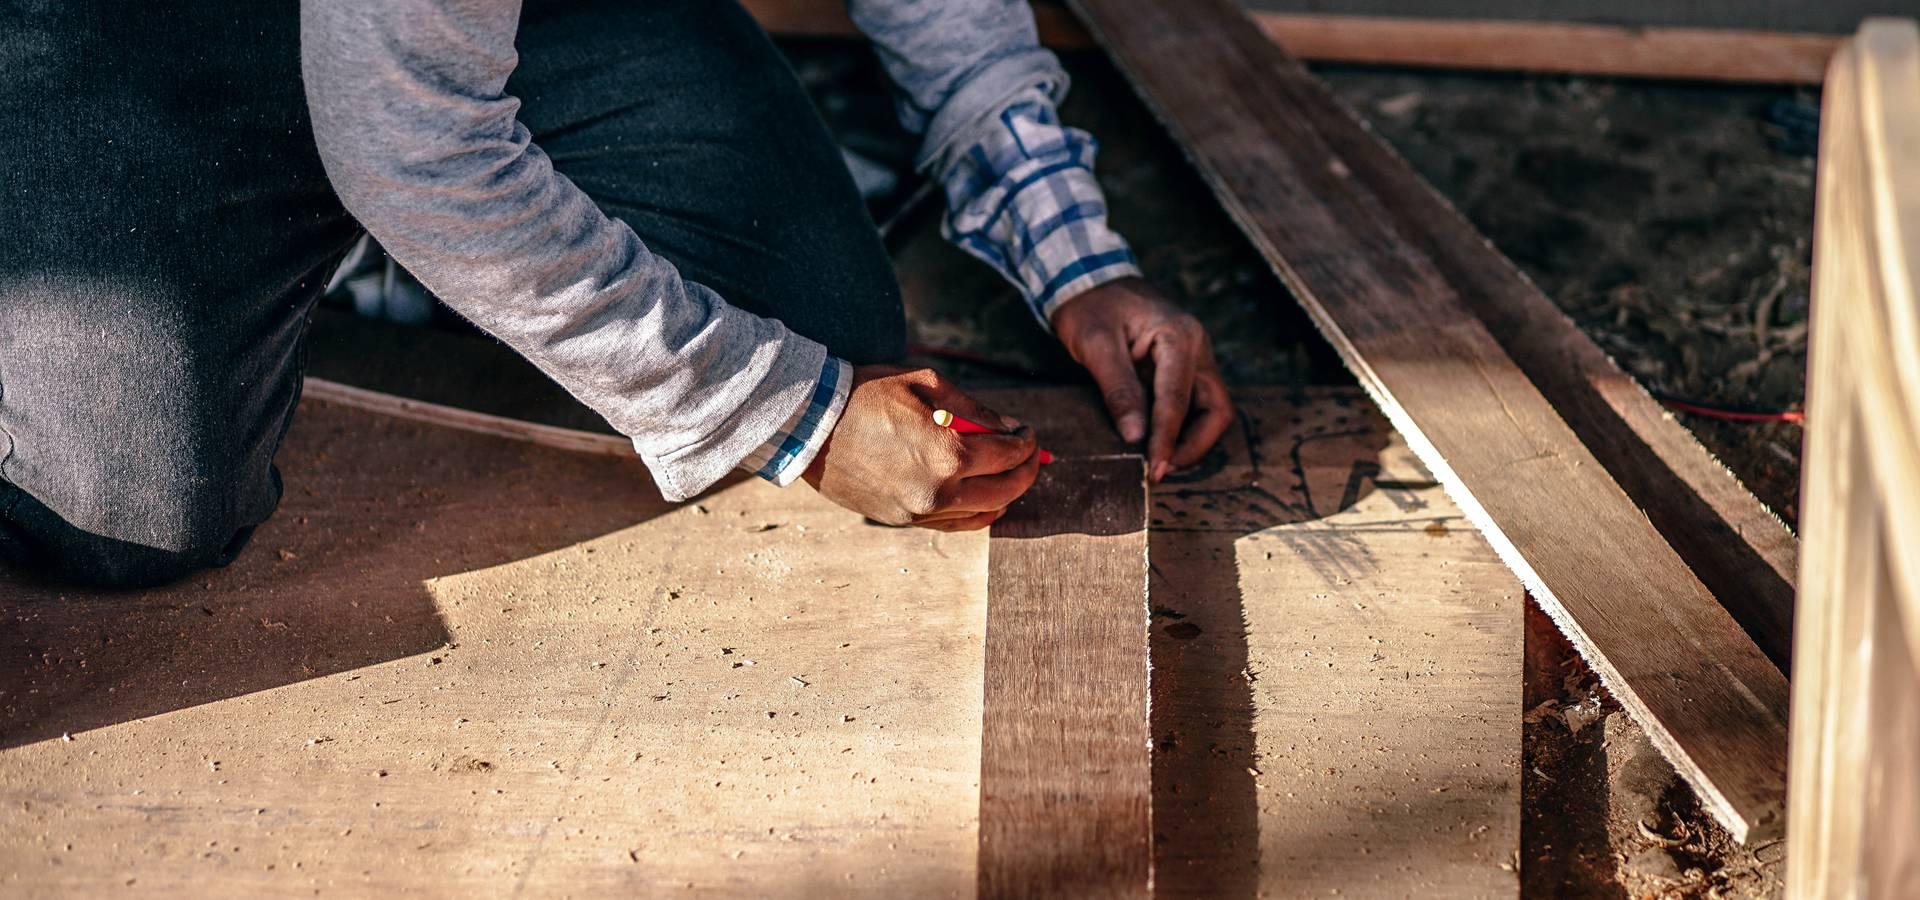 Şişli marangoz ustası,mecidiyeköy marangoz,fulya marangoz,beşiktaş marangoz